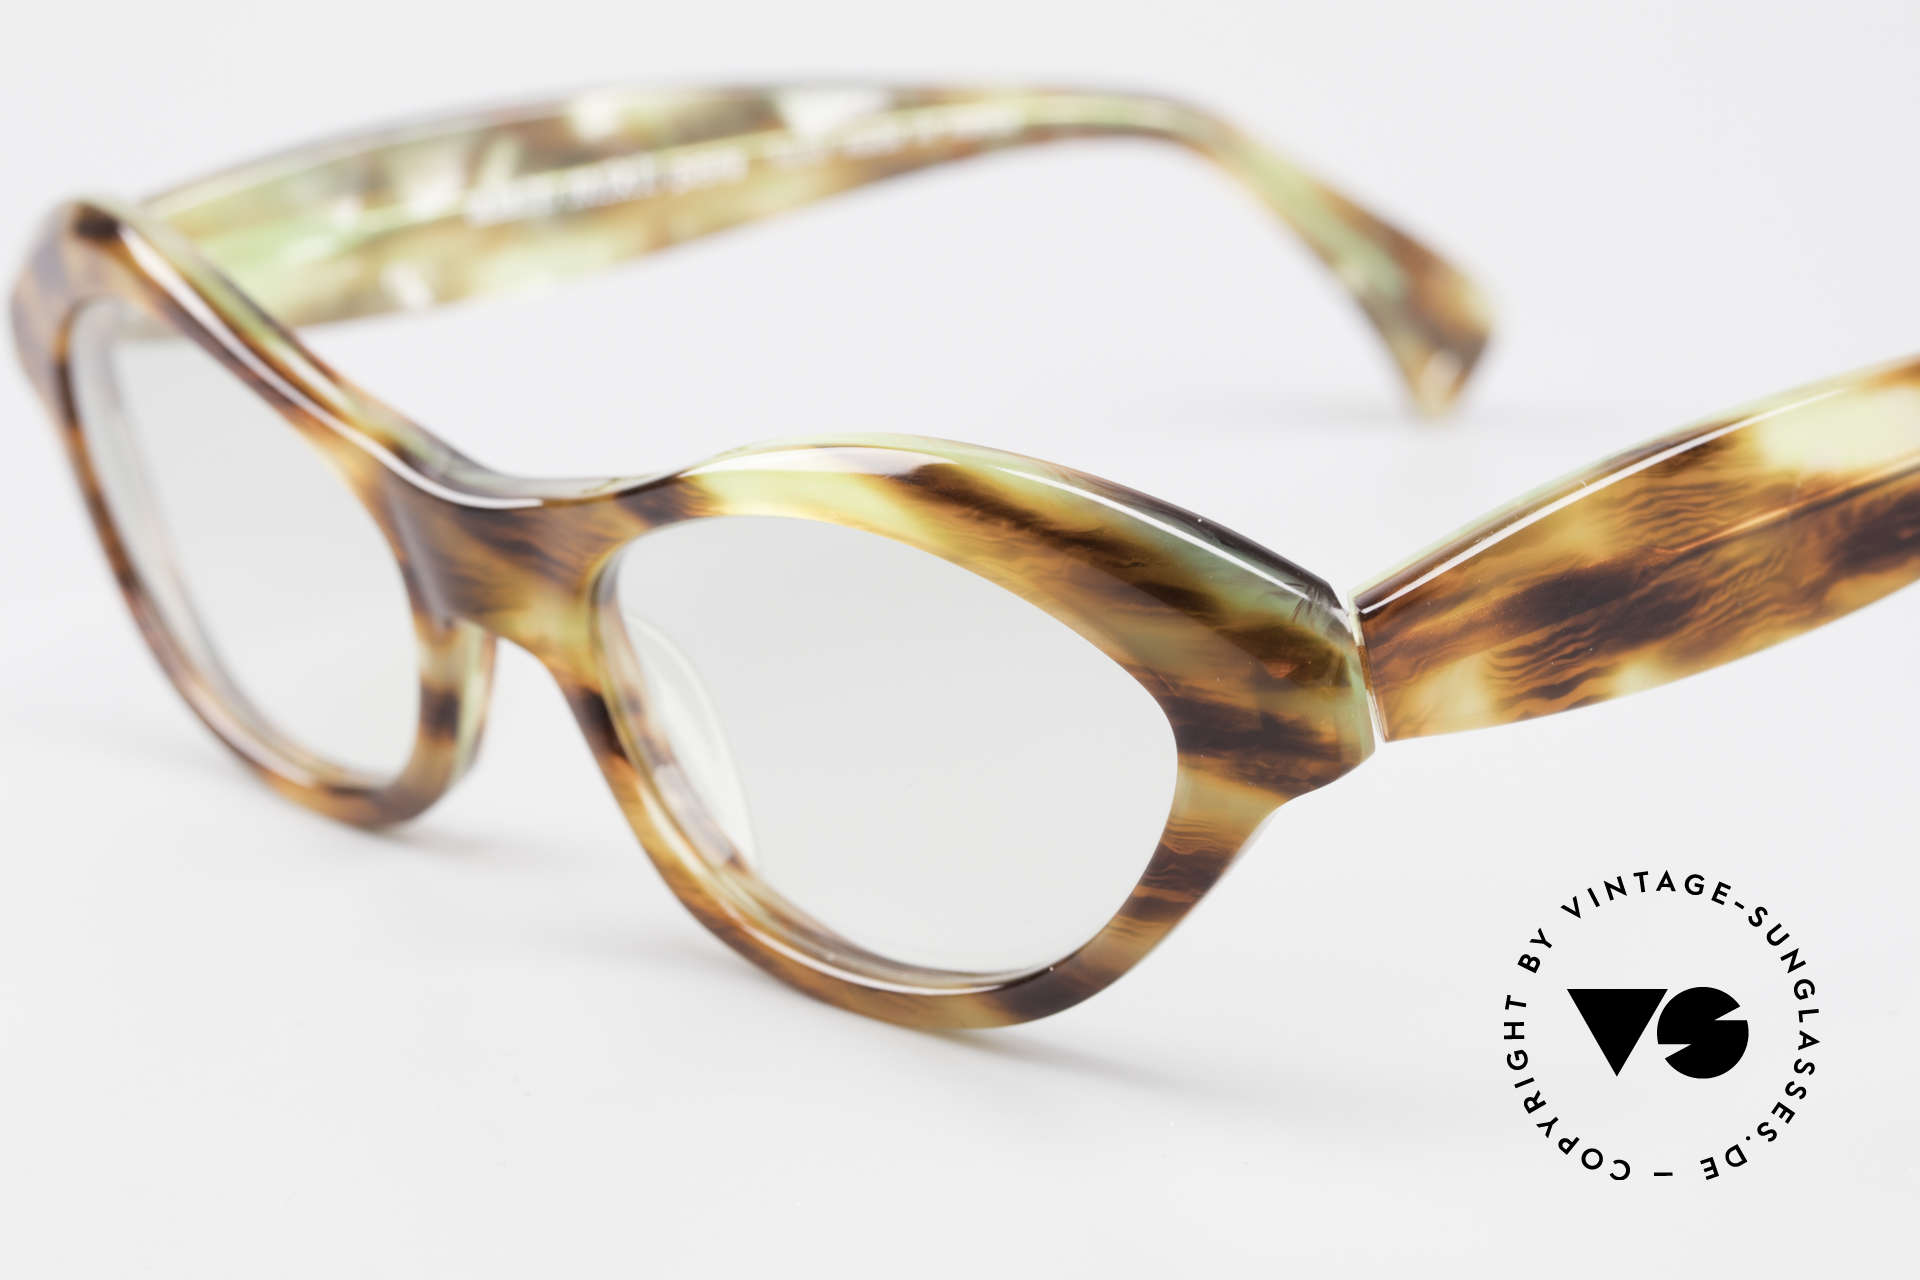 Alain Mikli 2112 / 1036 80's Cateye Designer Shades, excellent craftsmanship (handmade in France), Made for Women